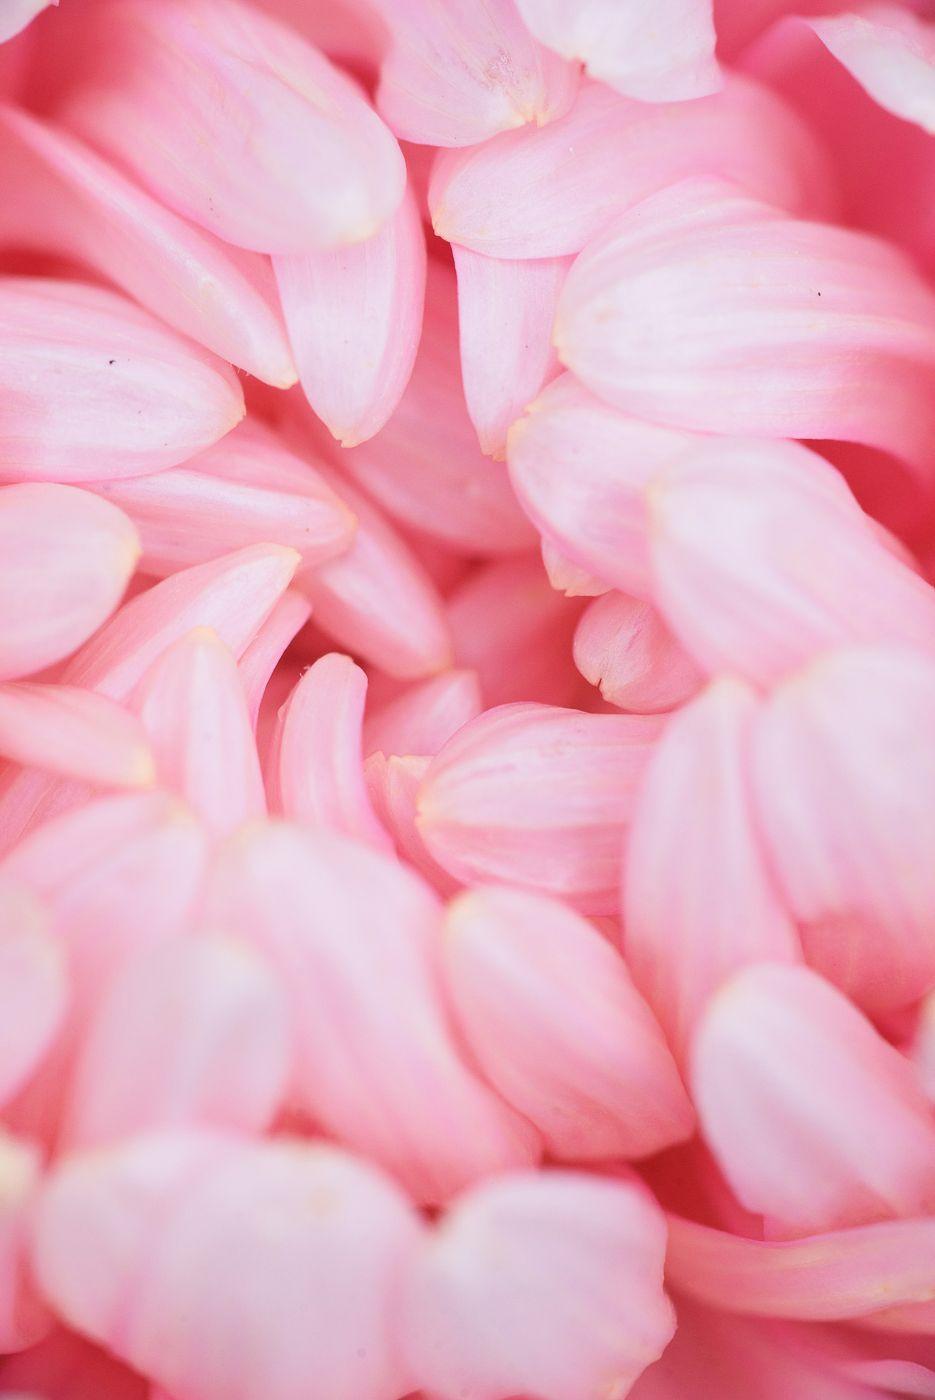 *** макро цветок природа пионовидная астра пион пионовидный лепесток бутон